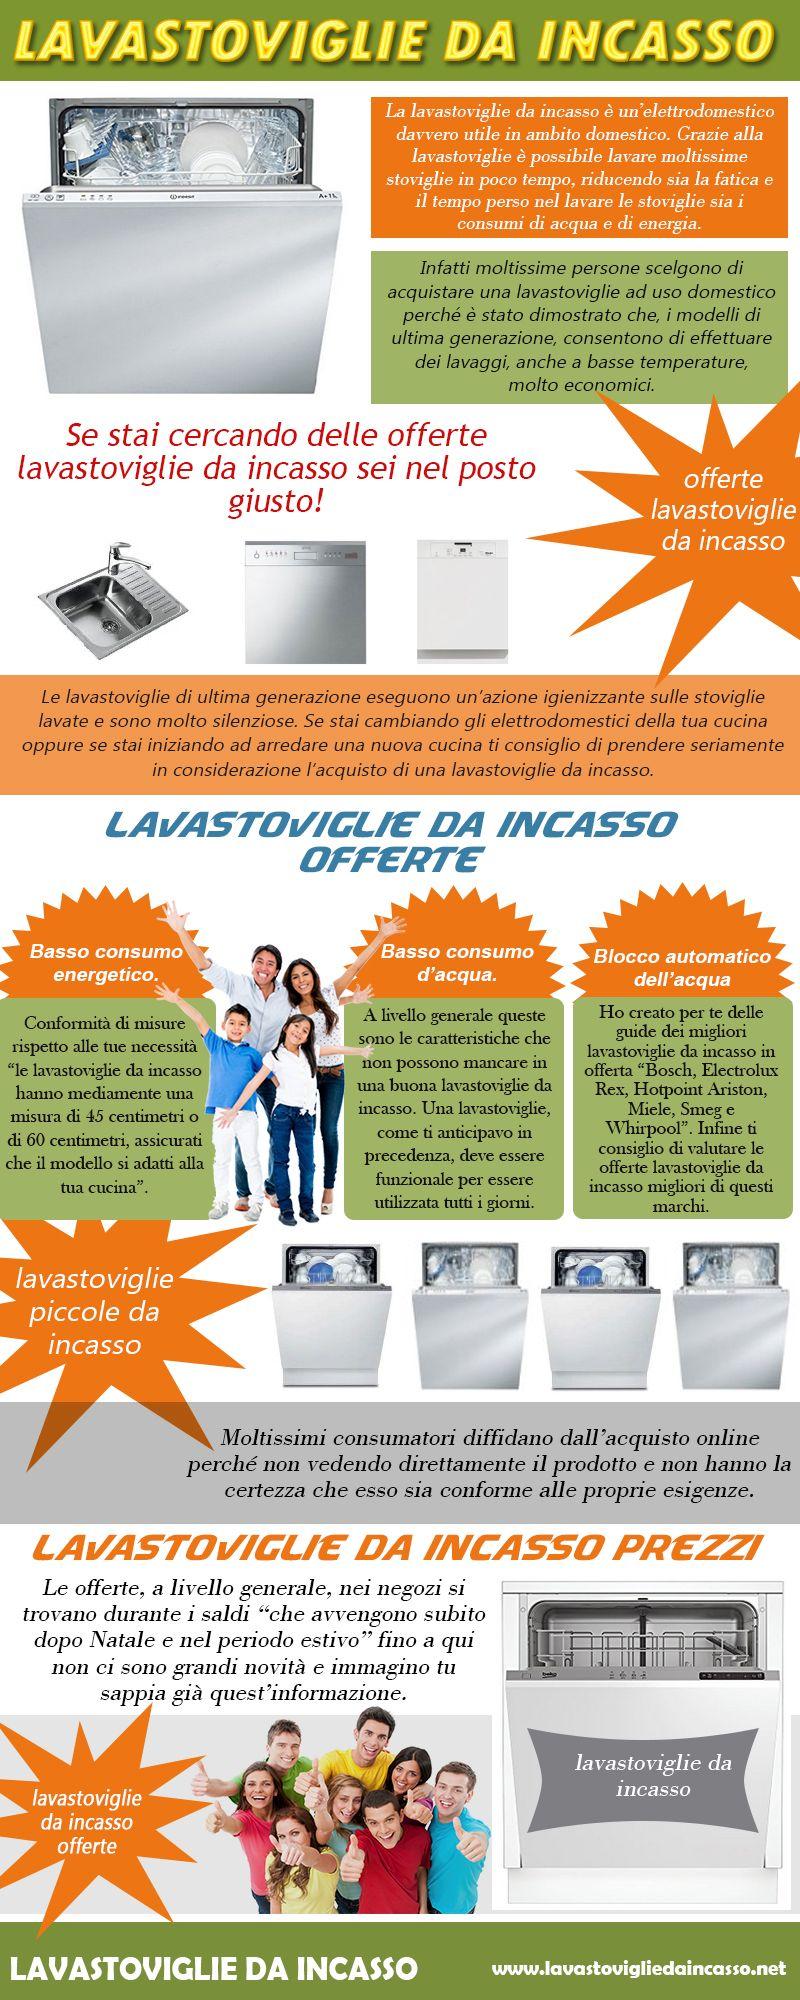 Pin by lavastoviglie incasso on lavastoviglie da incasso | Pinterest ...